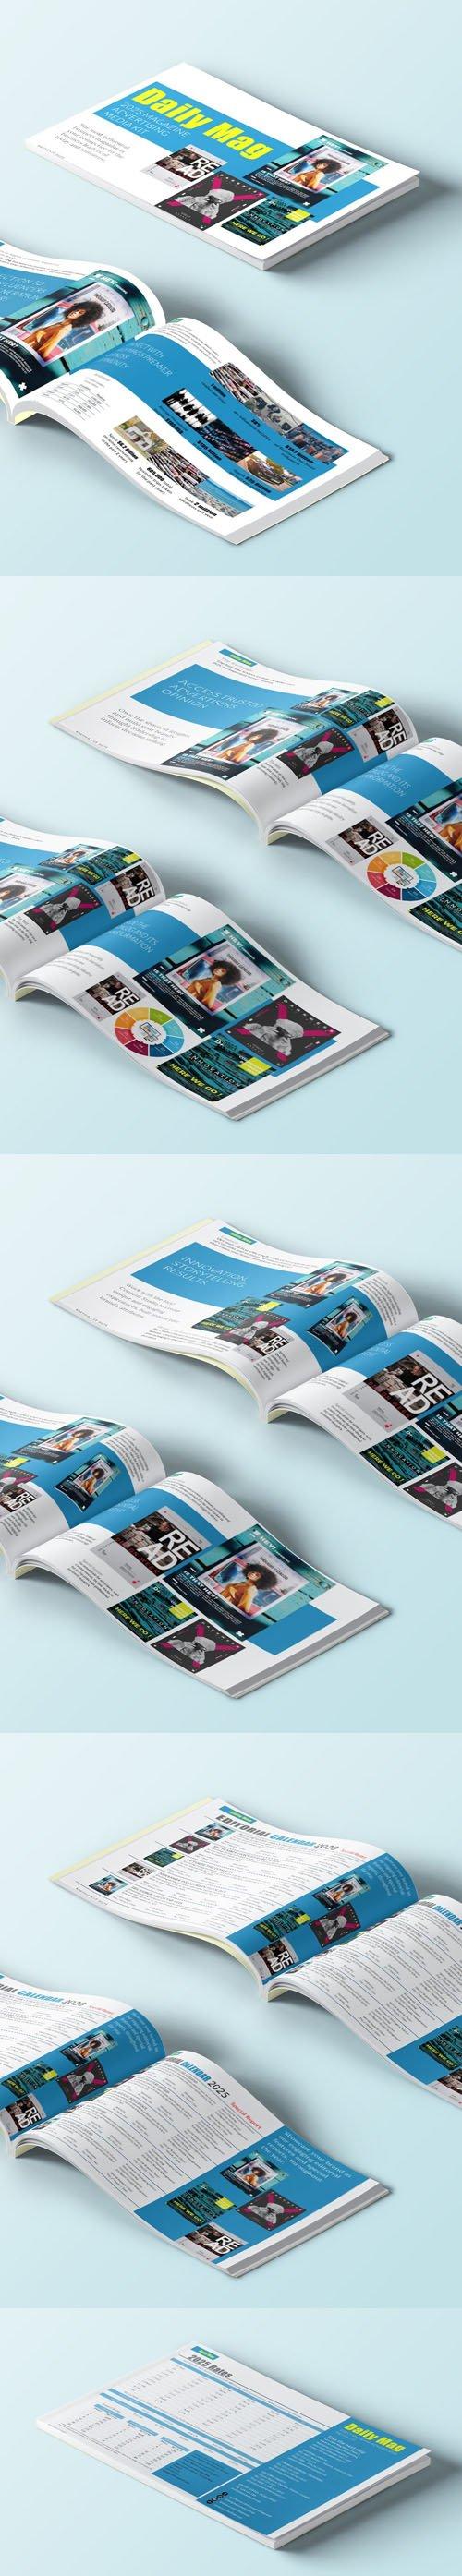 Magazine Advertising Media Kit Templates